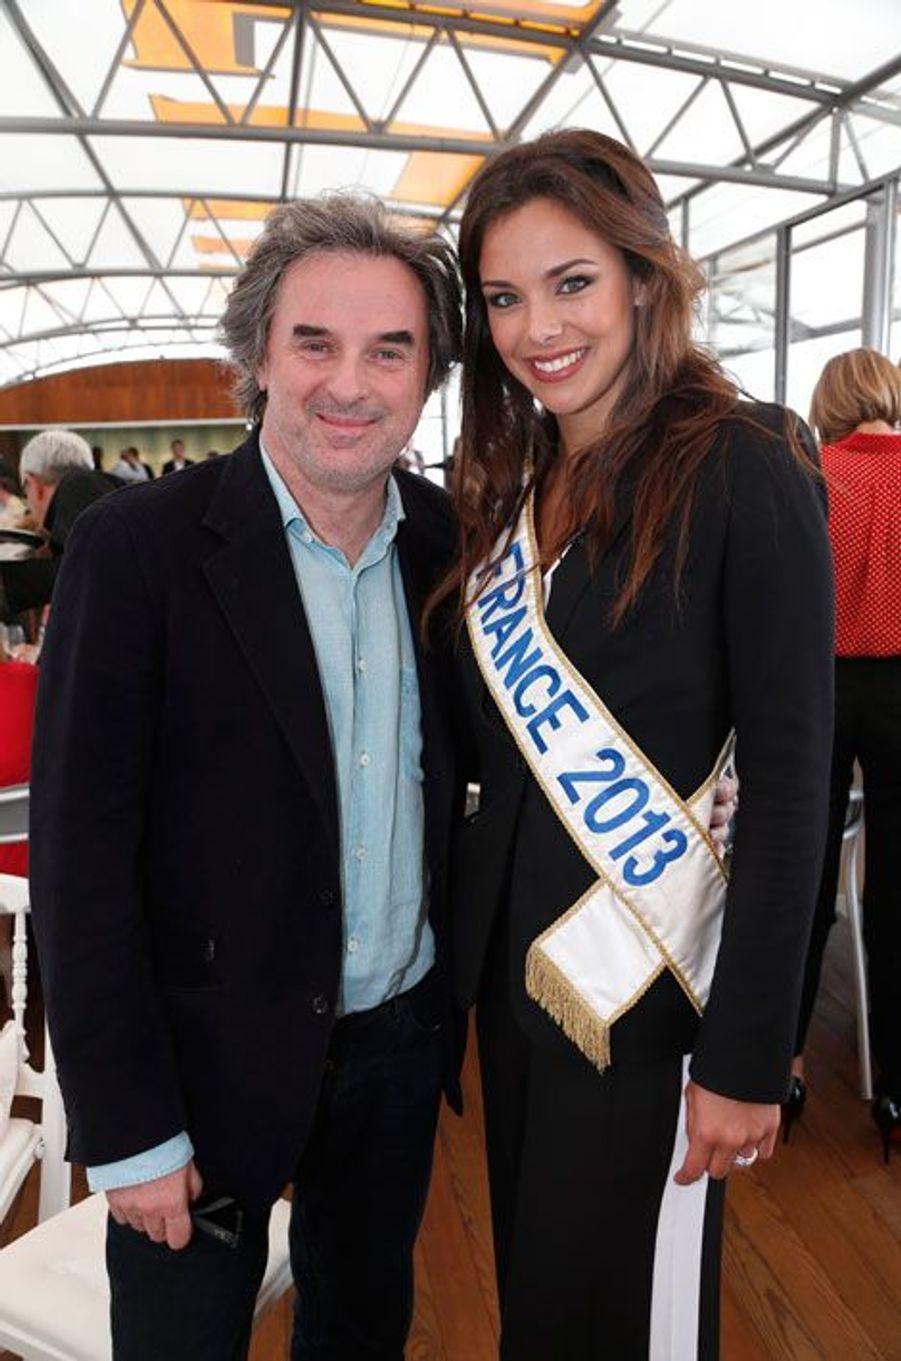 Jean-Christophe Grangé et Marine Lorphelin, Miss France 2013.